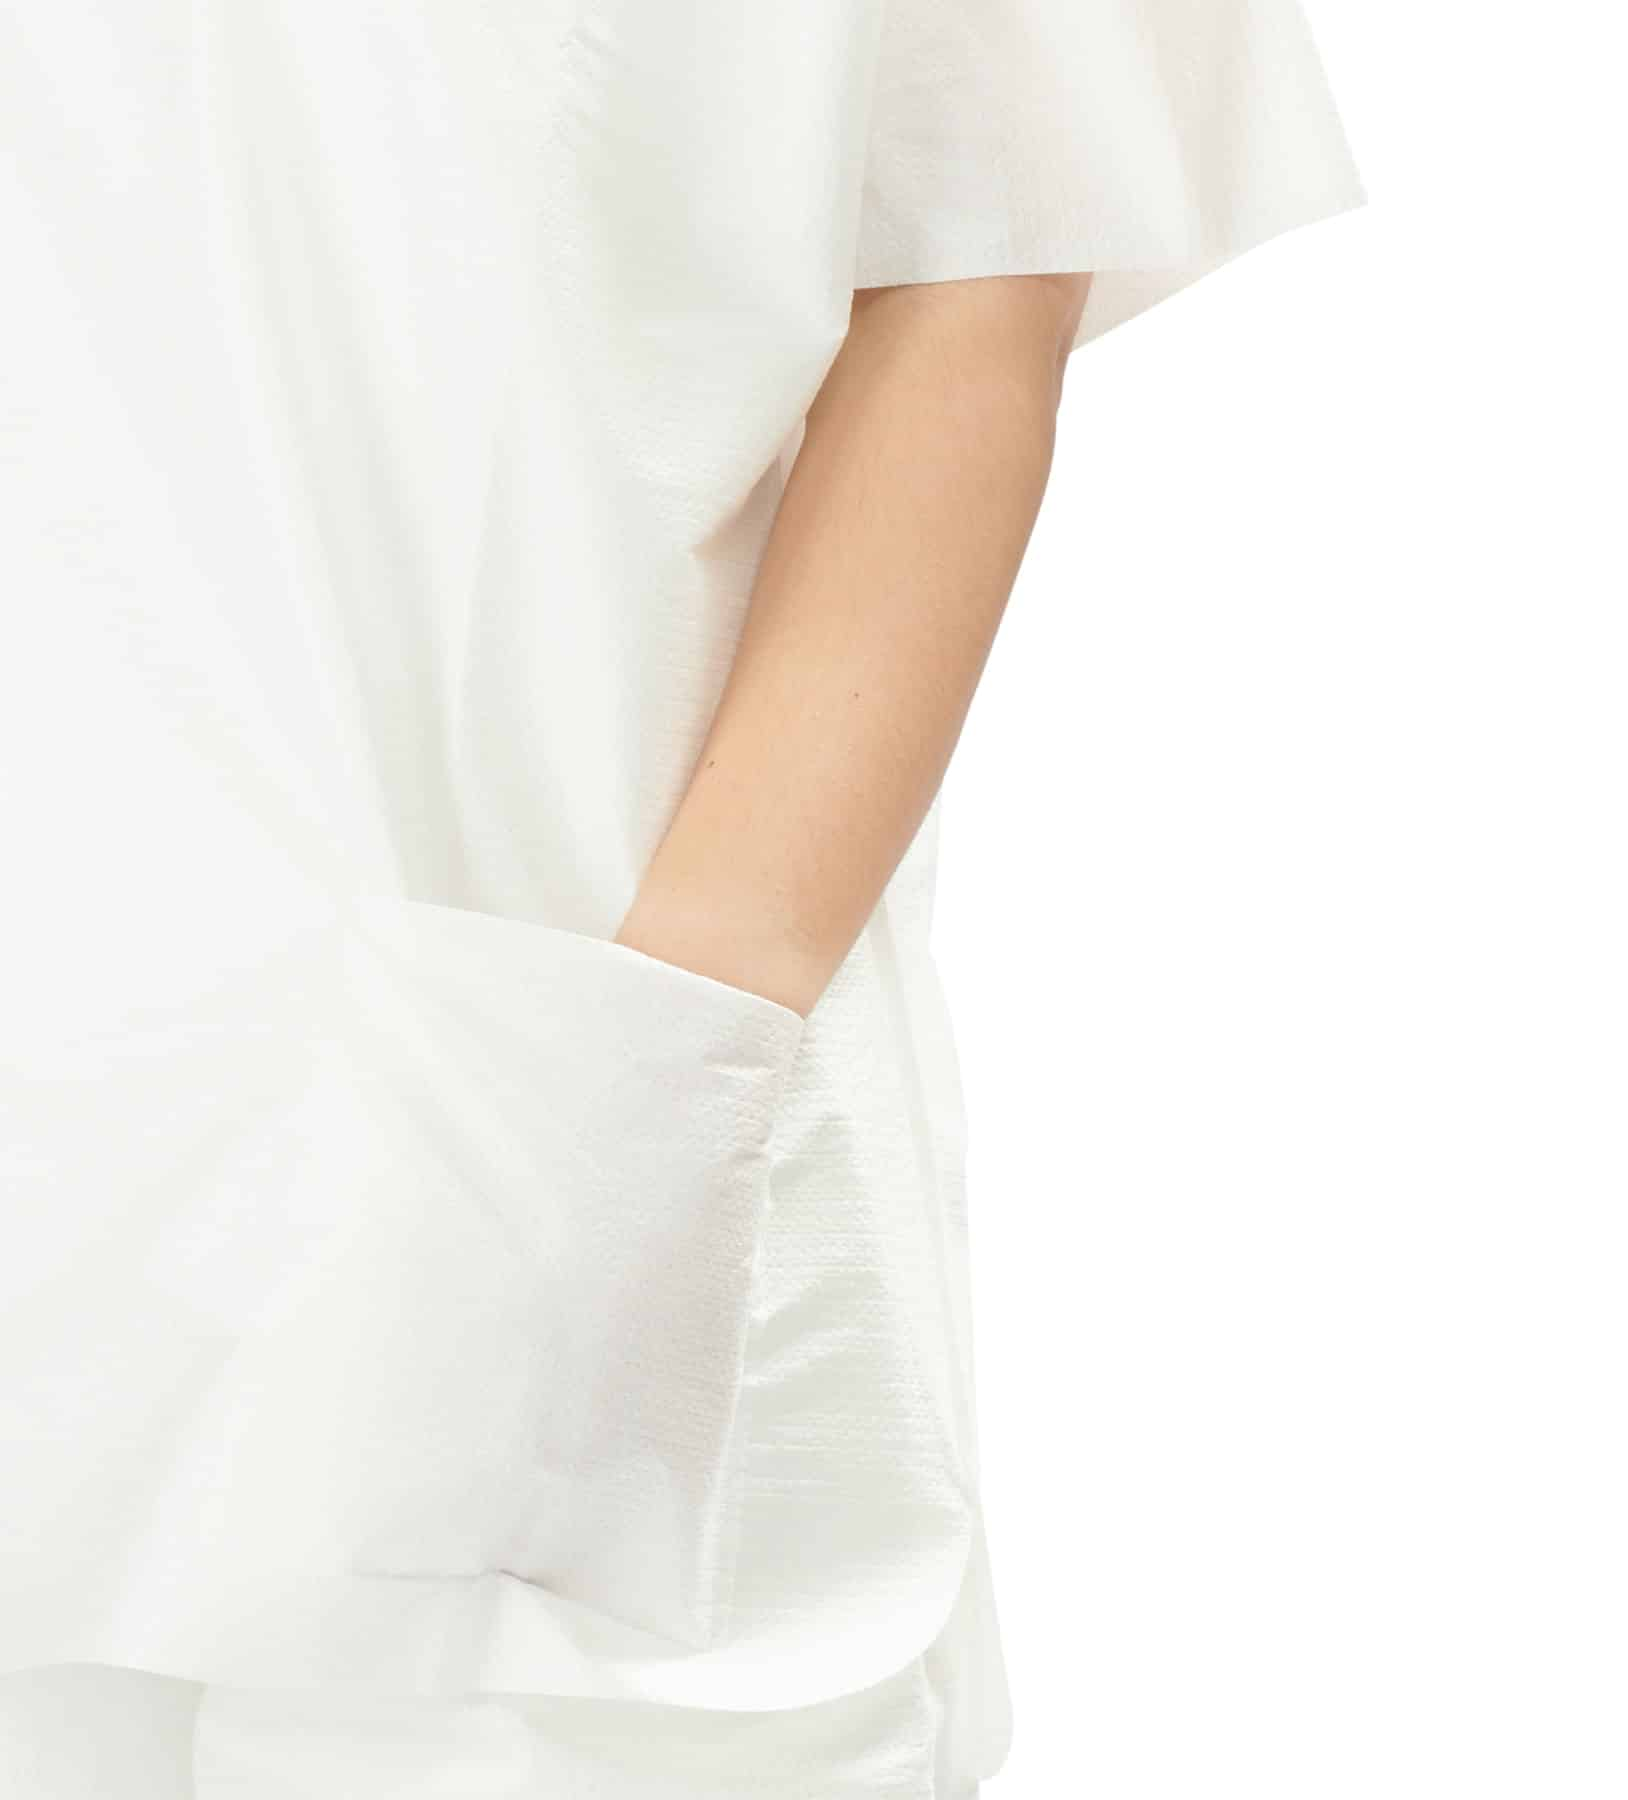 fardas de bloco hidrófuga 4 - water repellent scrubs - clothe protect